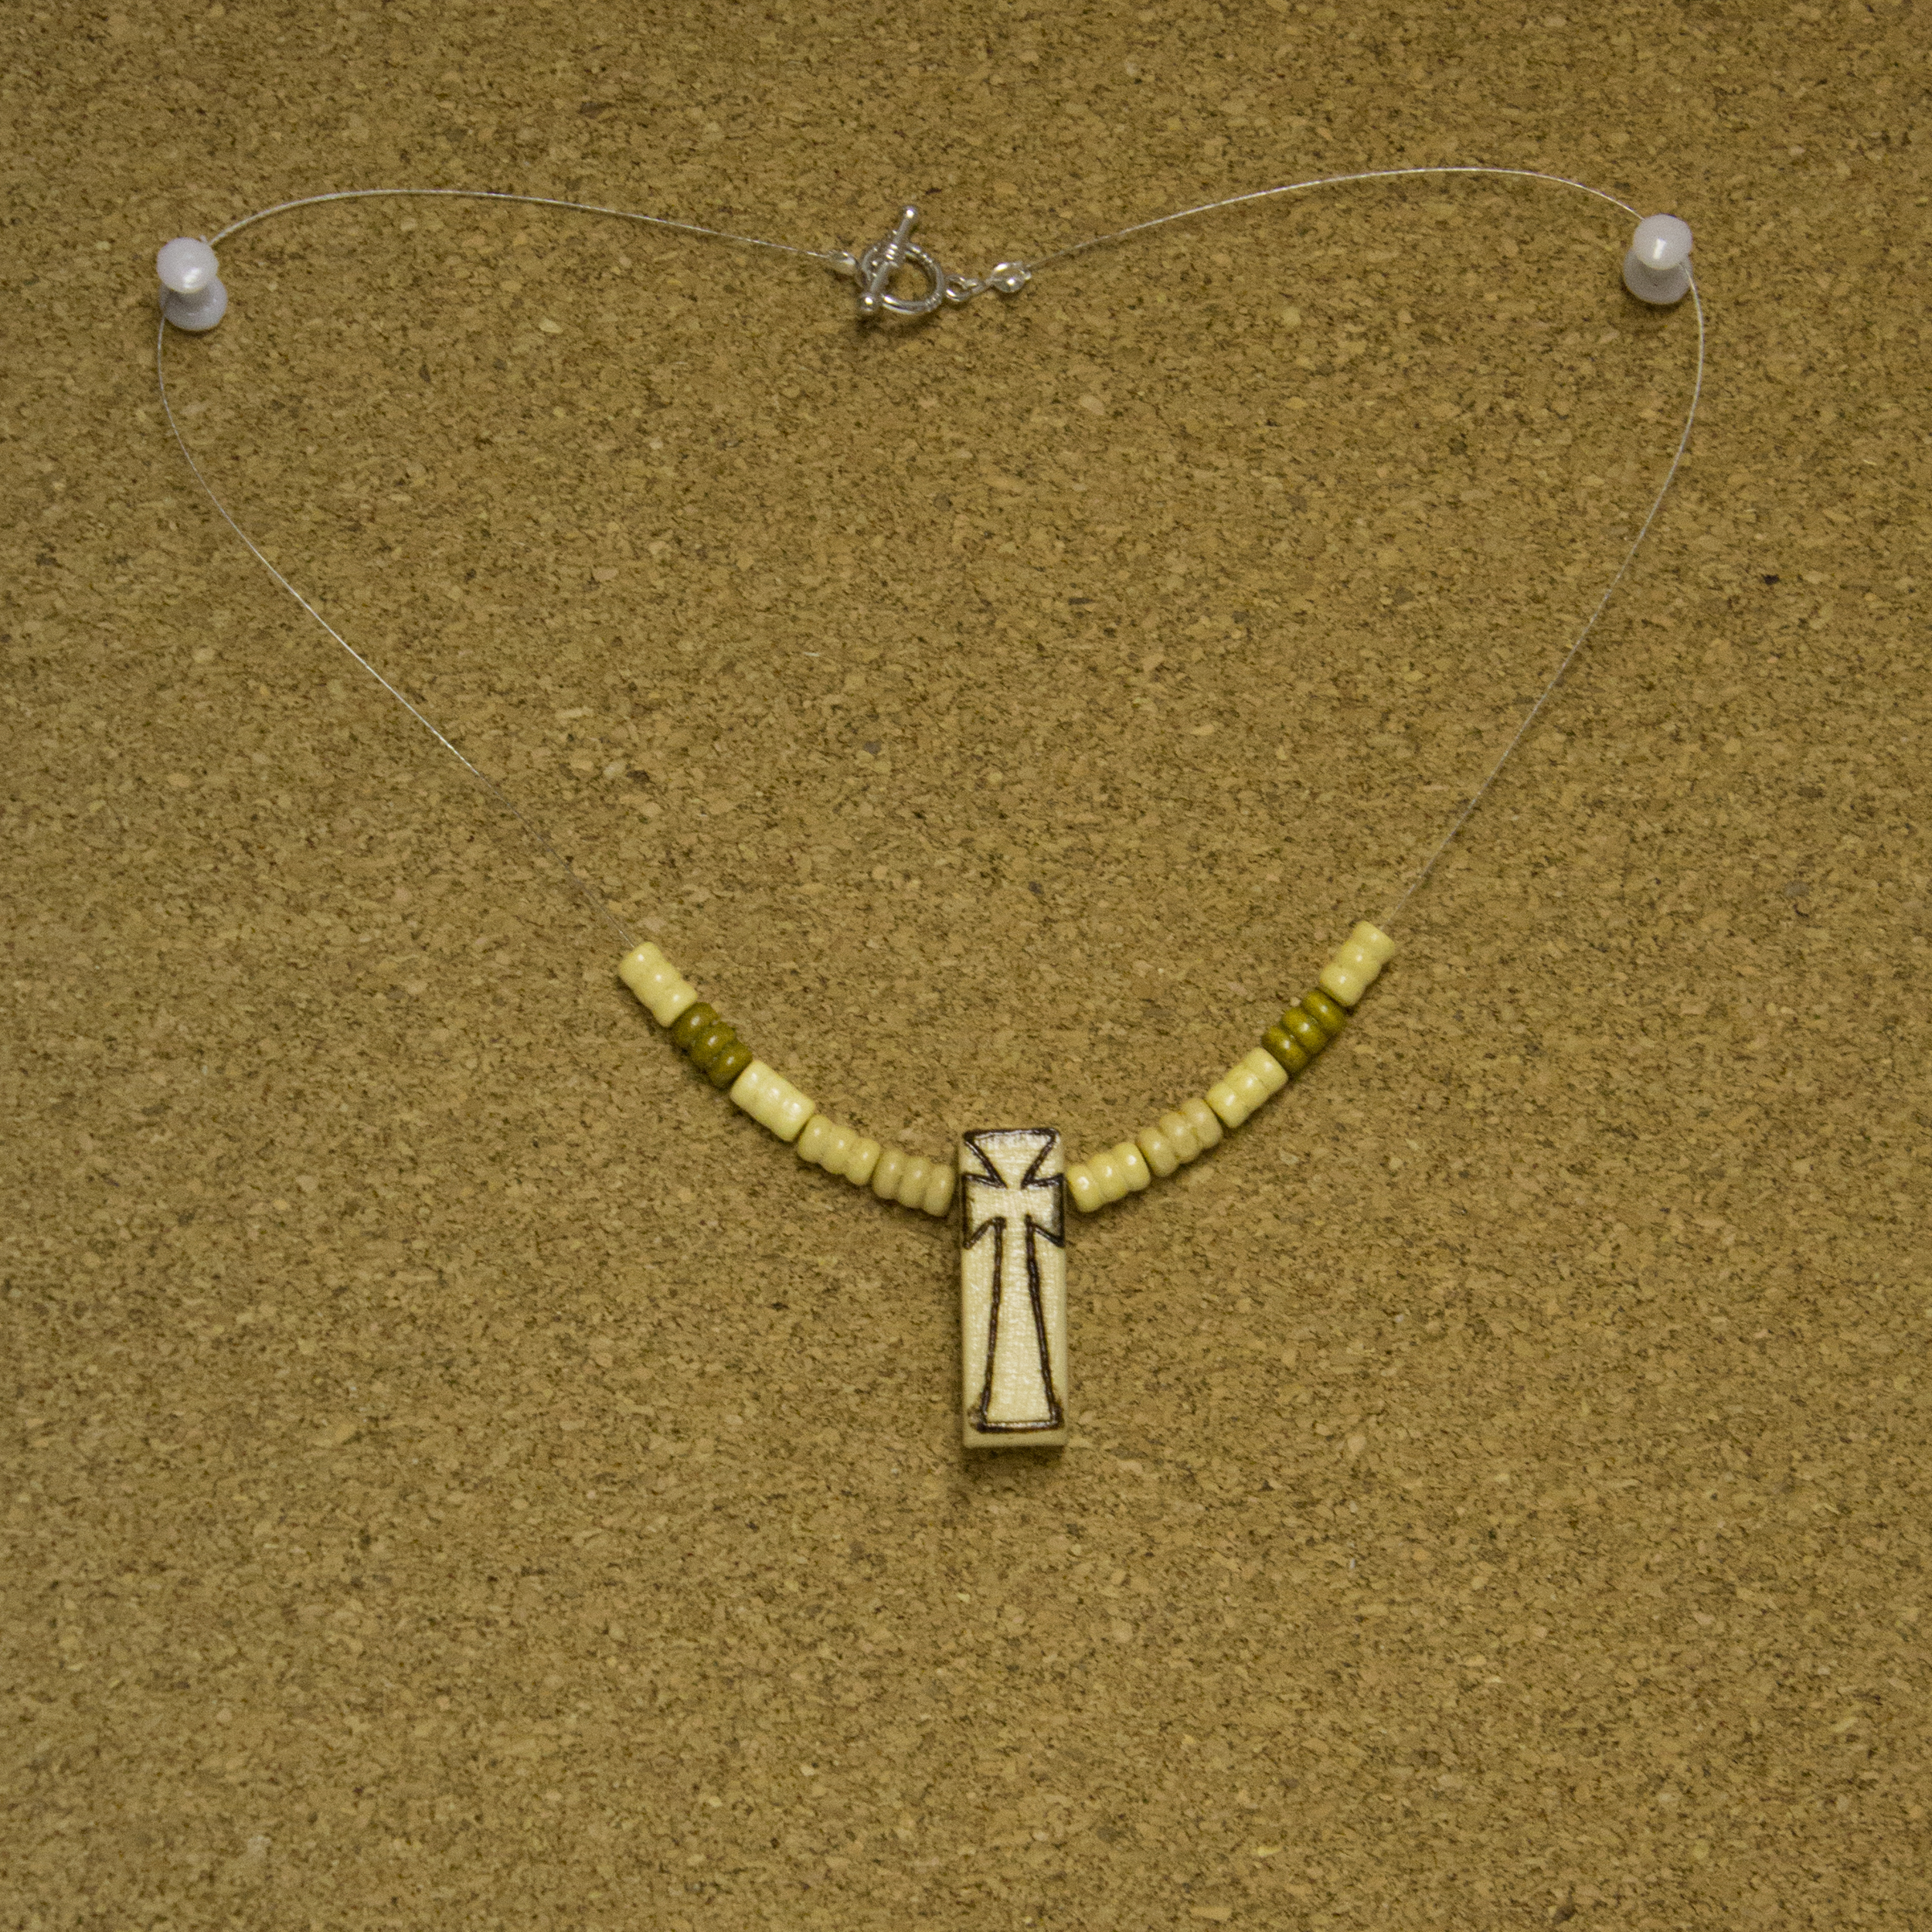 Cross Necklace - $5